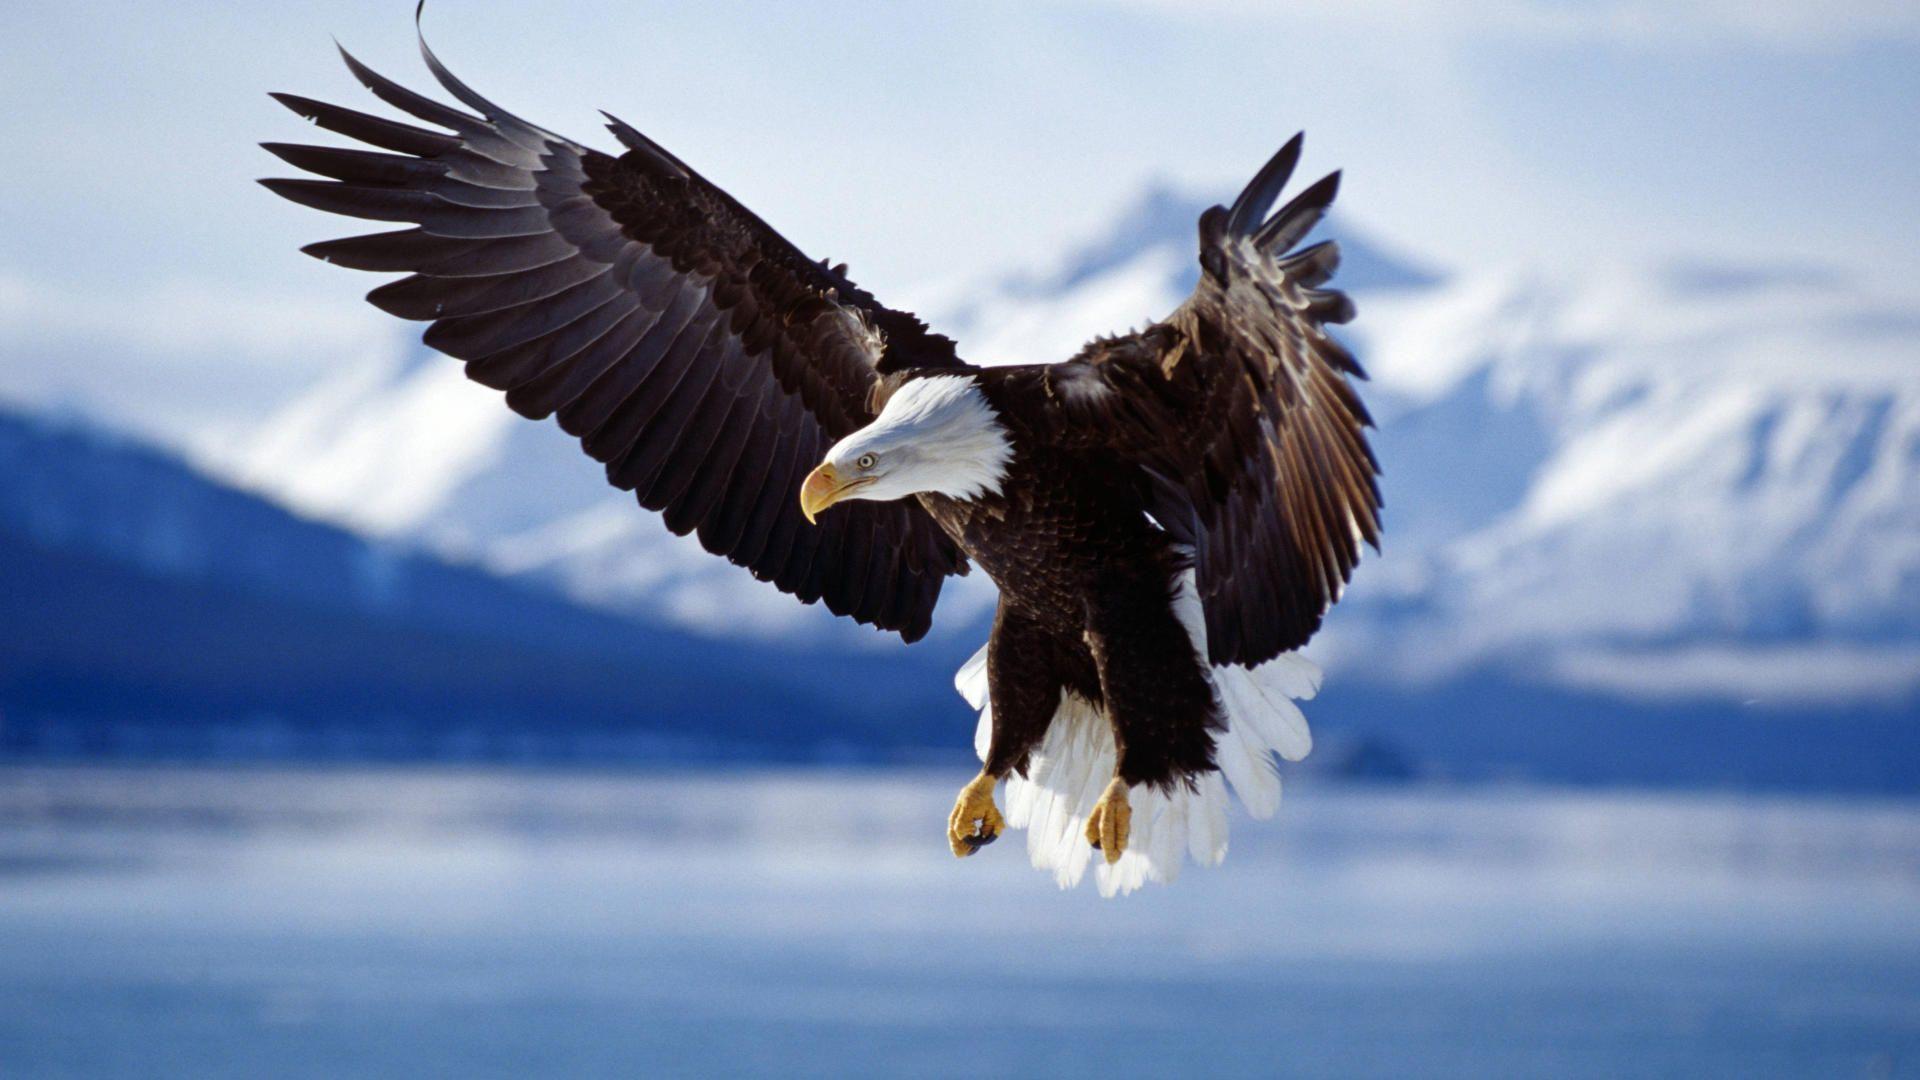 eagle animals wallpaper background winter flight alaska 1920x1080